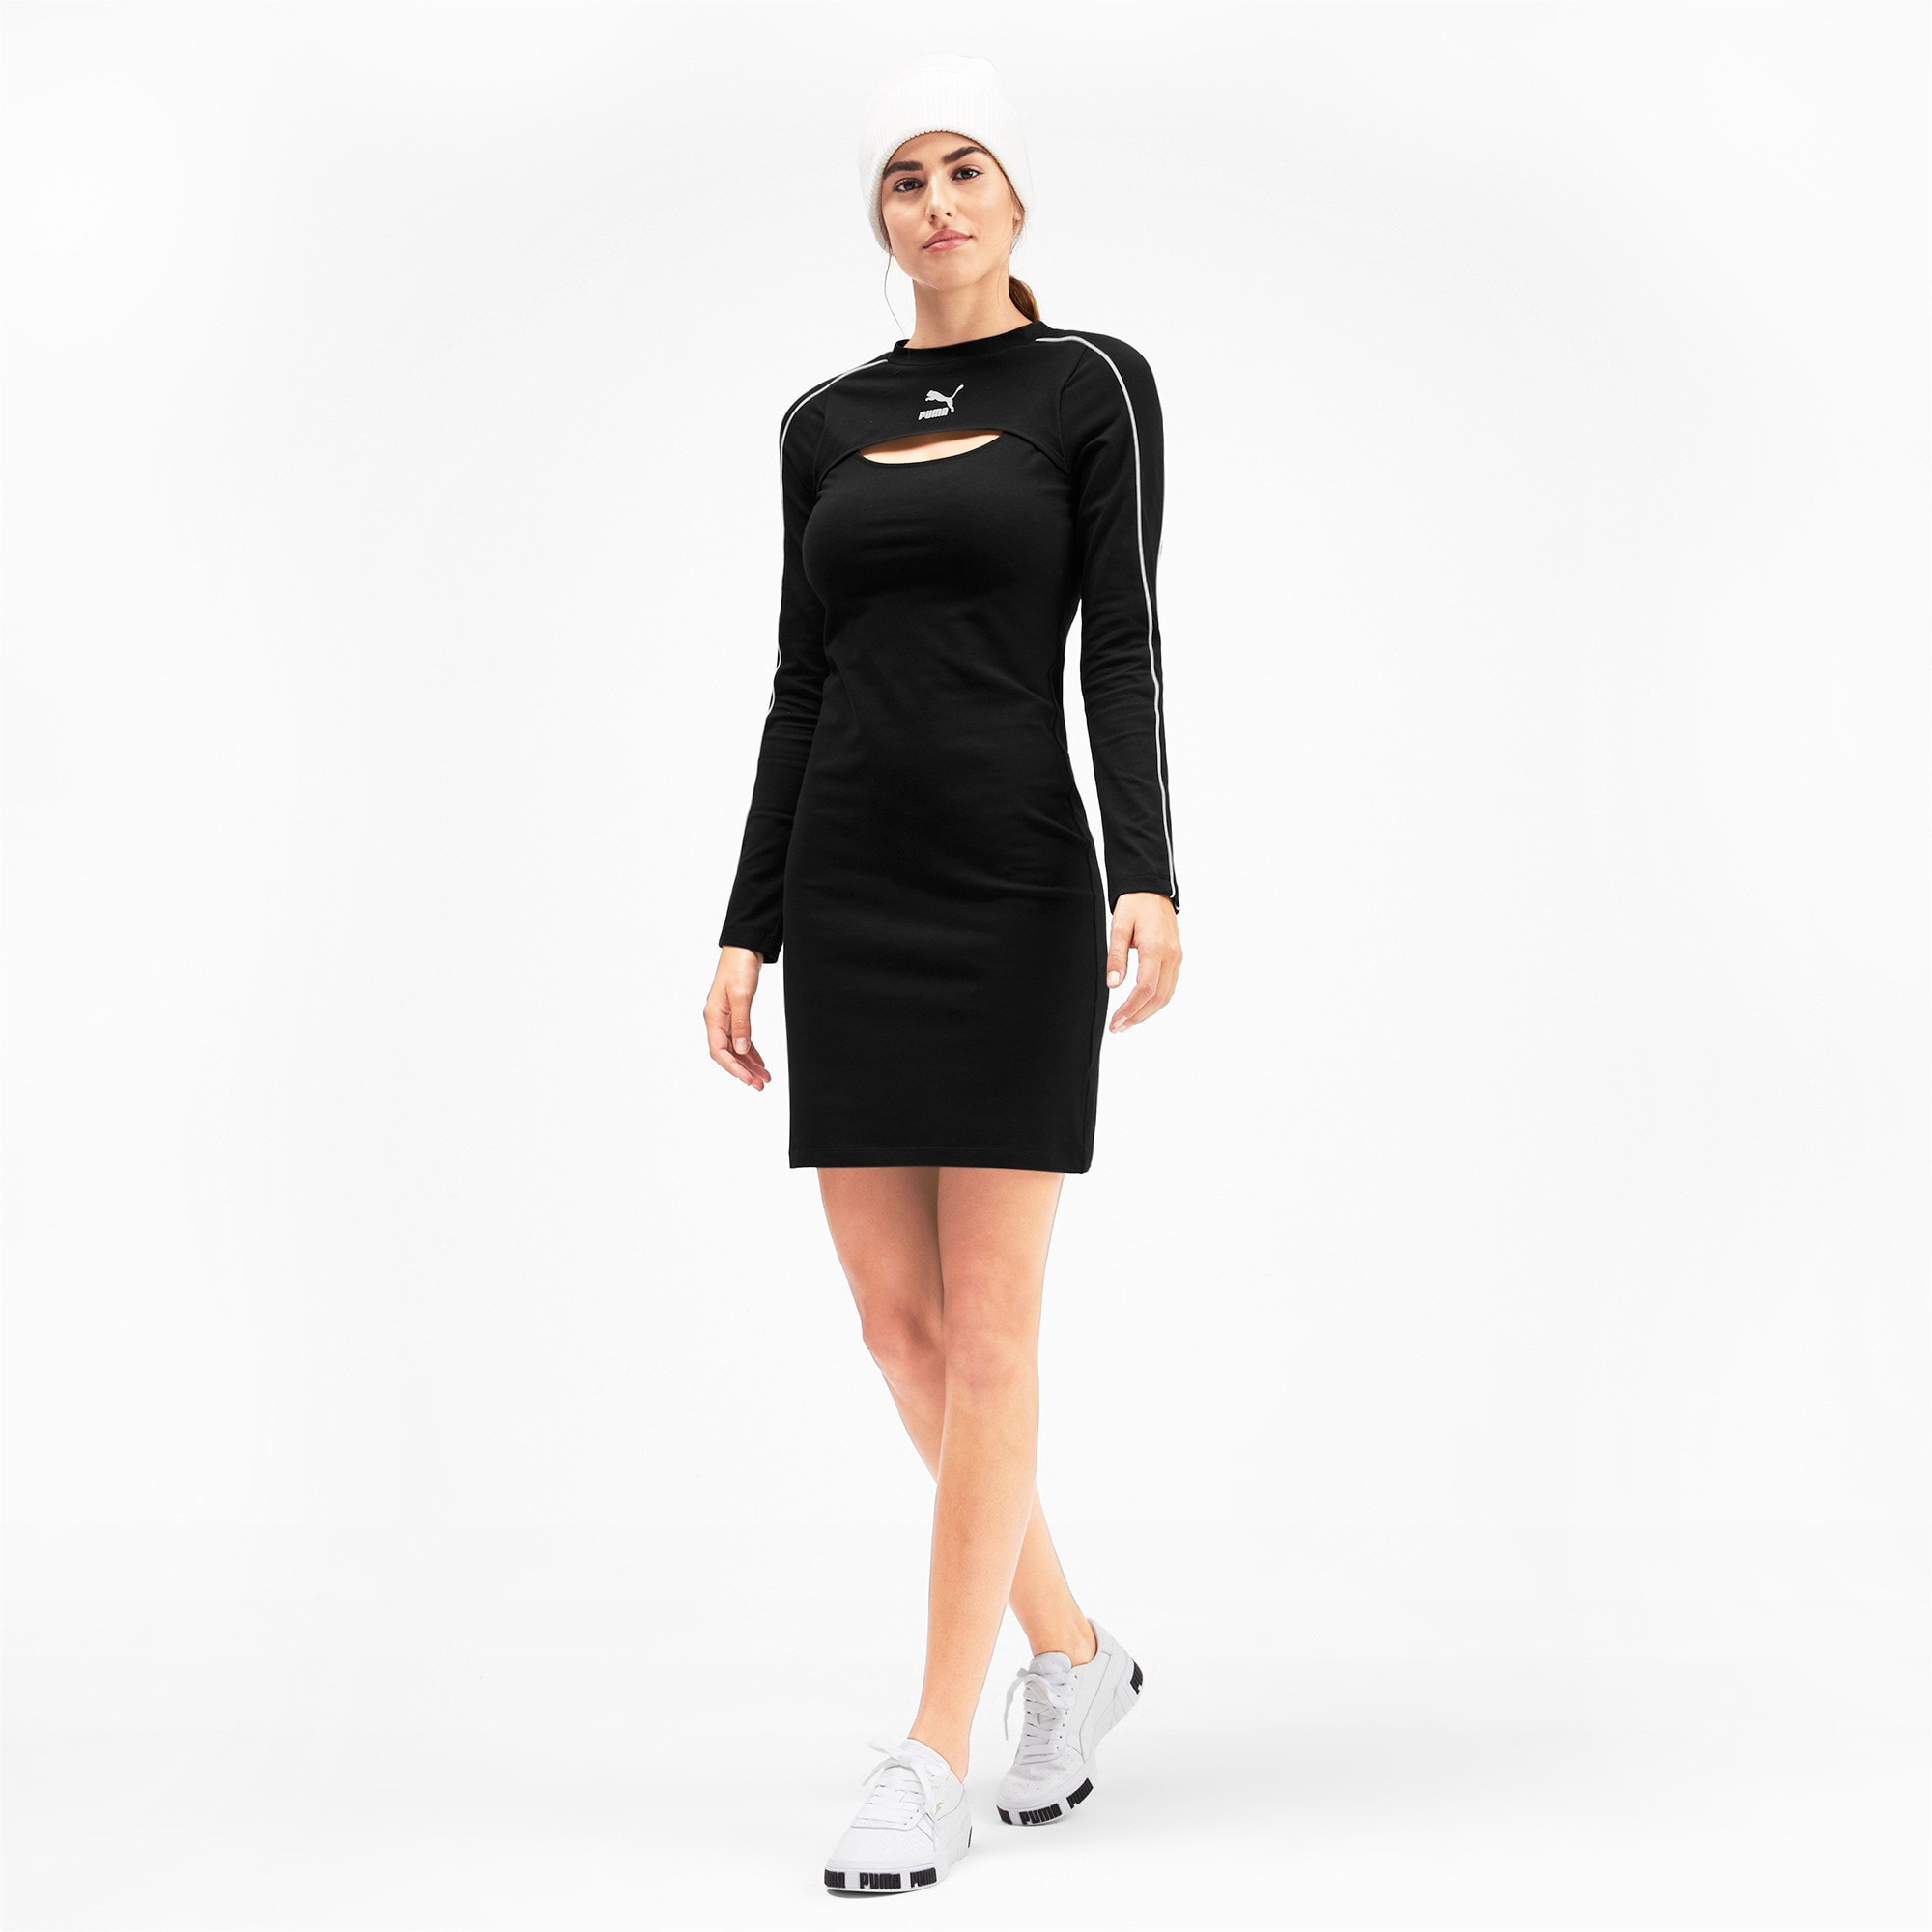 Thumbnail 3 van Classics jurk voor vrouwen, Puma Black, medium